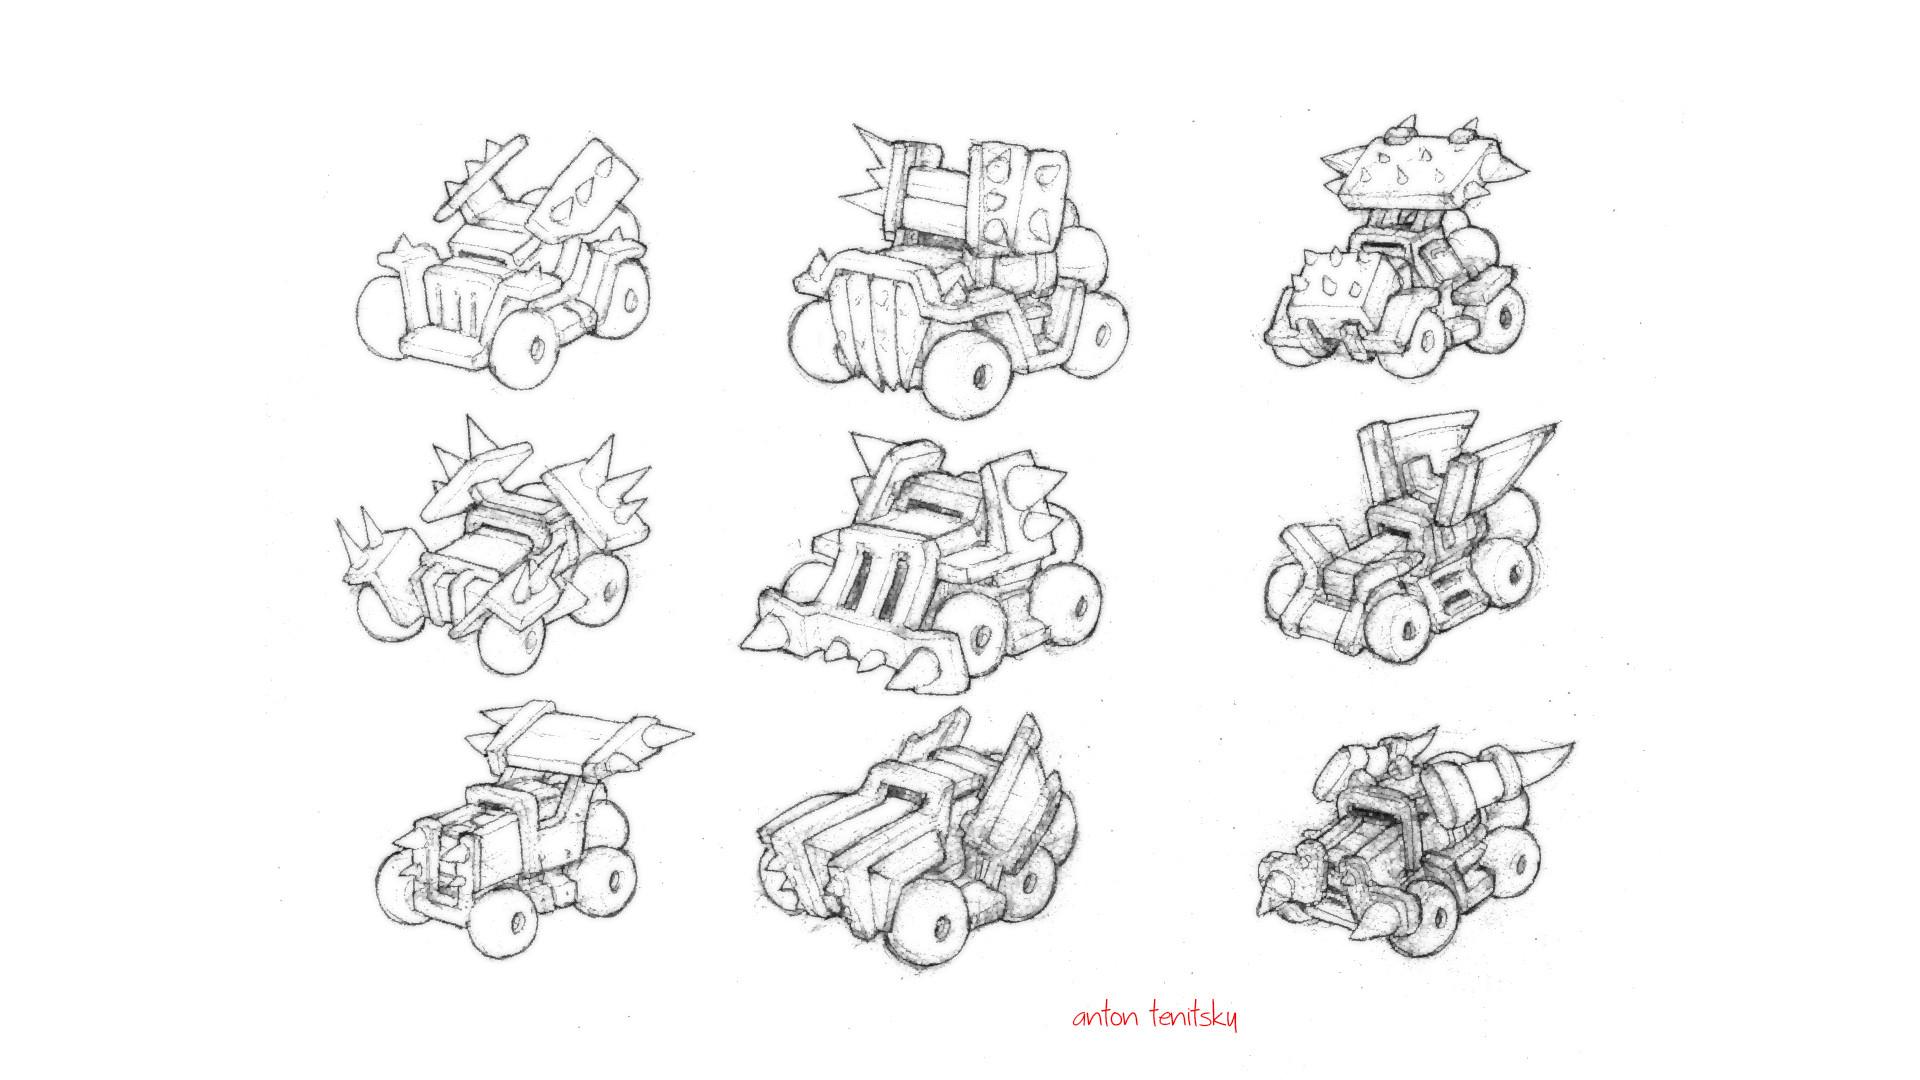 Anton tenitsky car anton tenitsky 001